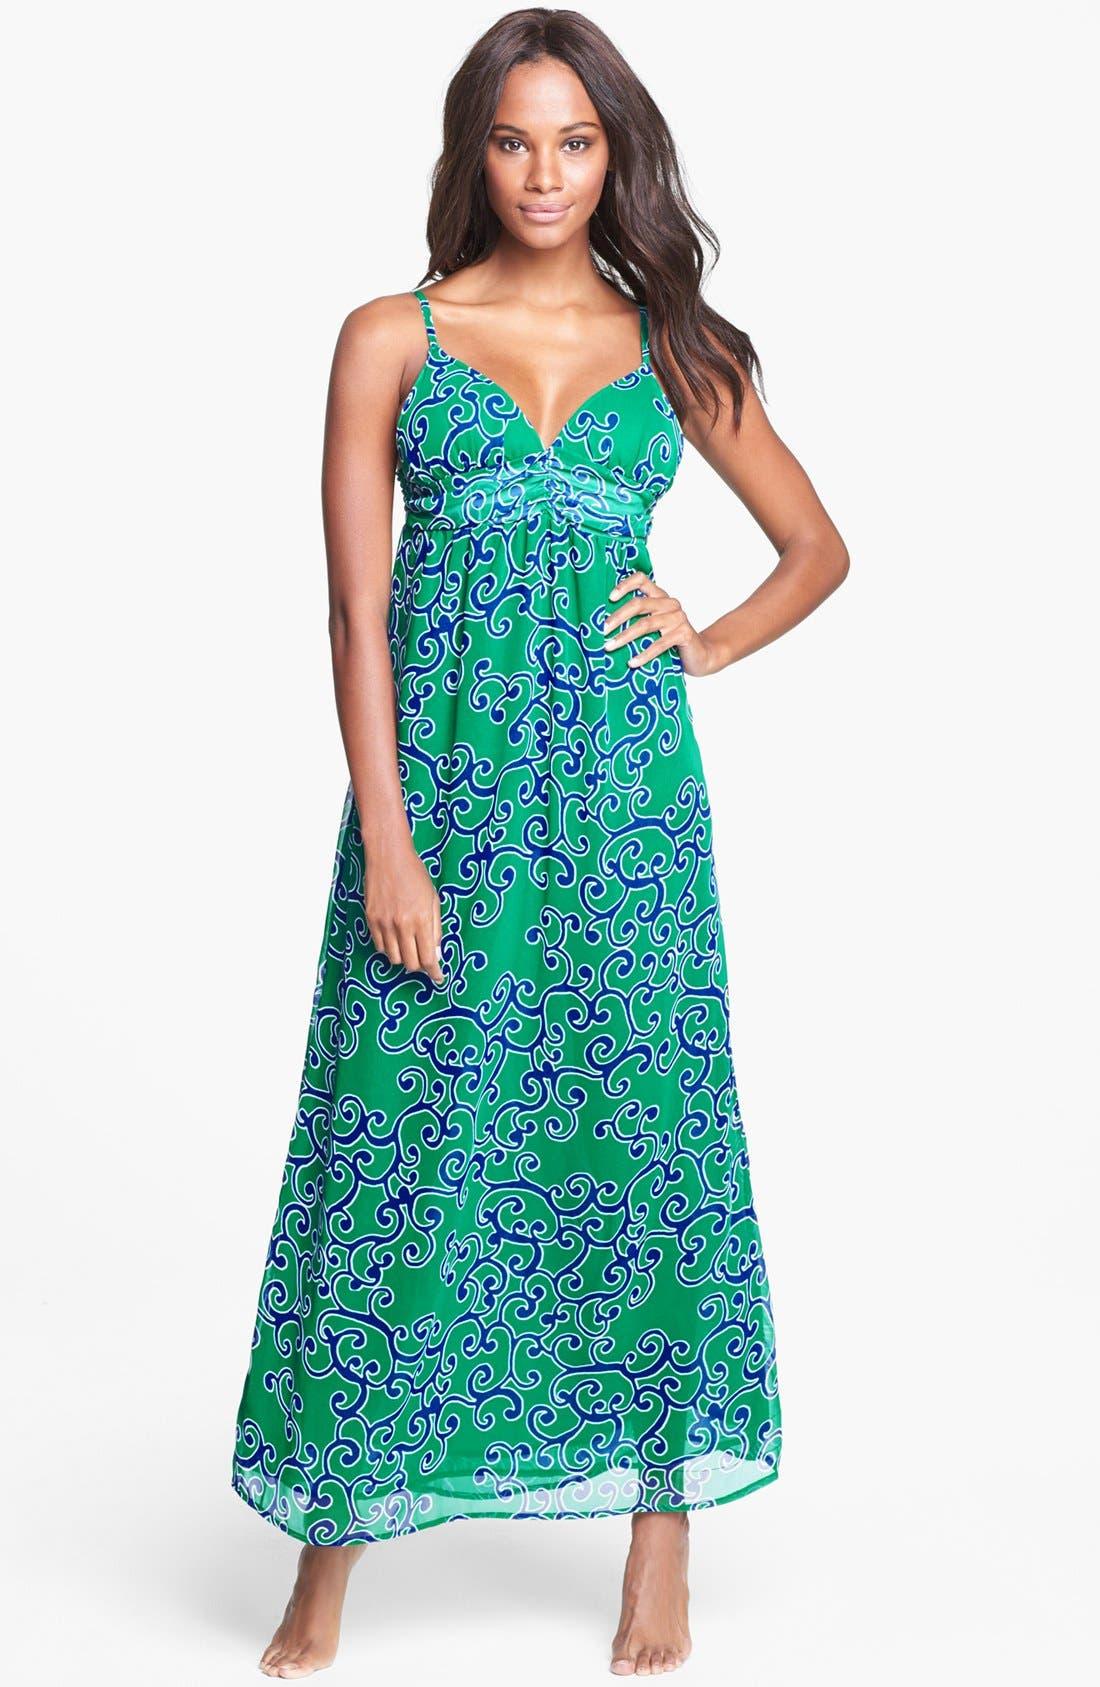 Main Image - Tommy Bahama 'Ocean Swirl' Cover-Up Maxi Dress